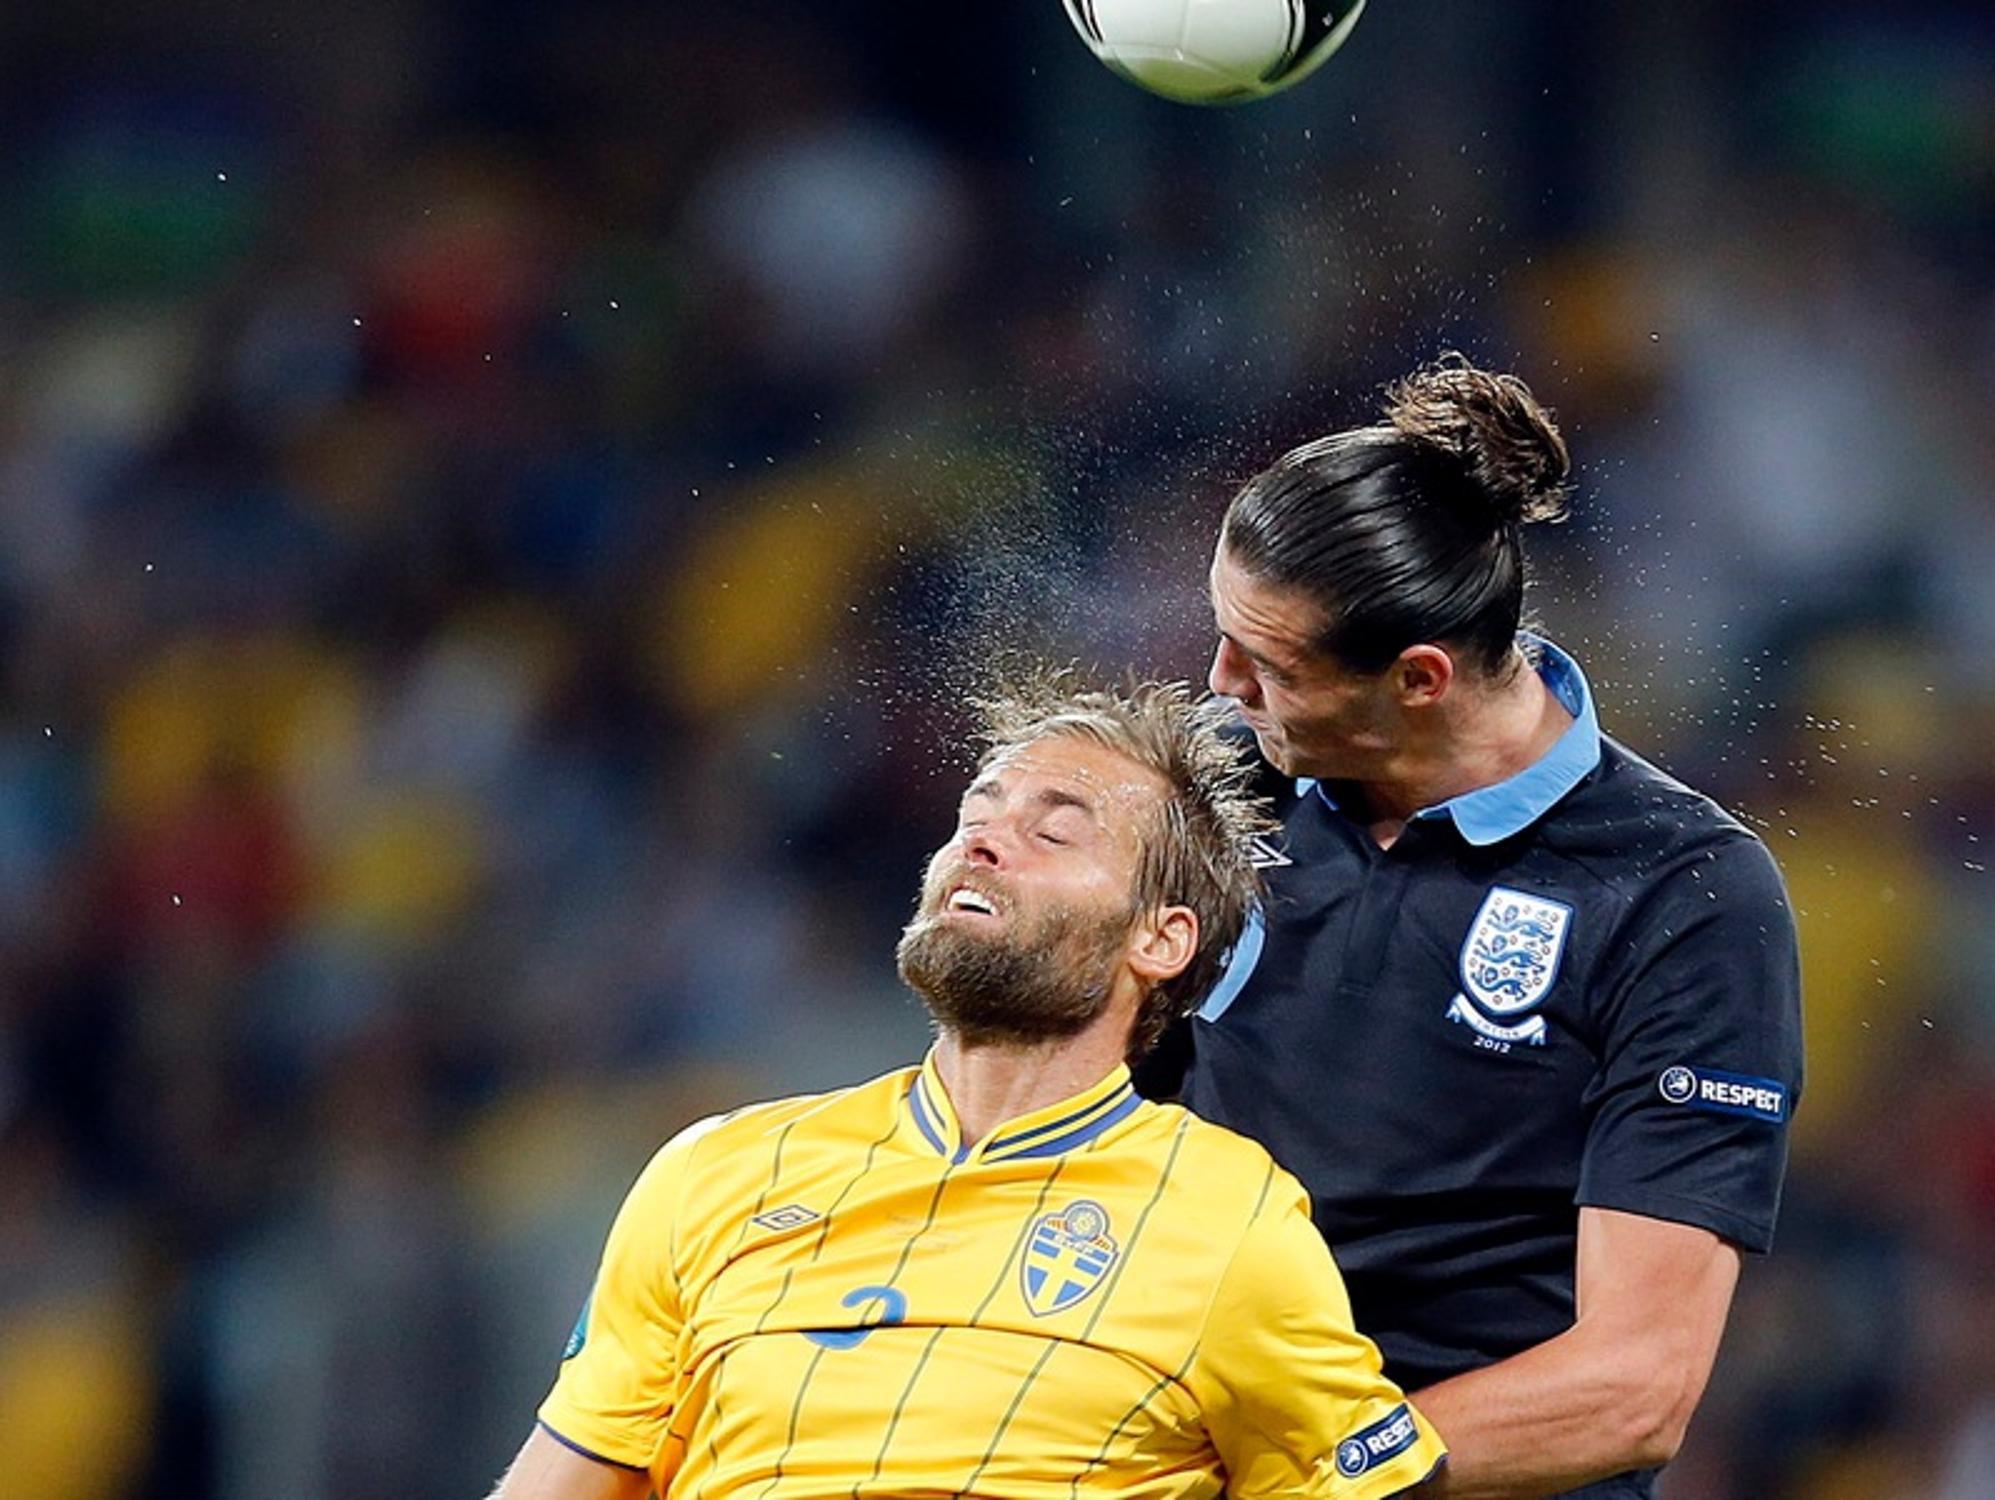 Star Friseur Lastert Uber Neue Rooney Frisur Fussball